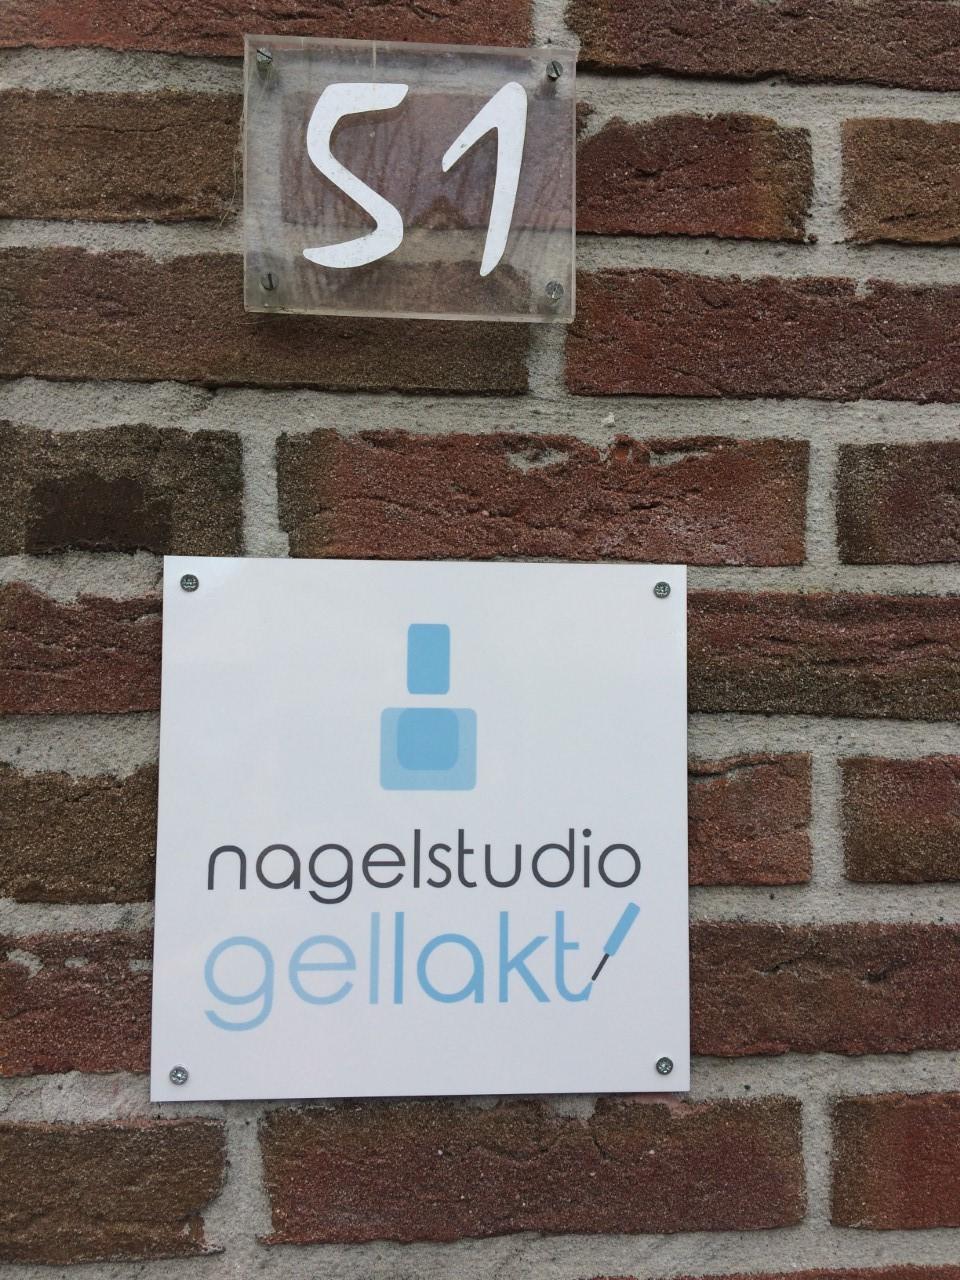 Nagelsalon Gellakt in Groningen.